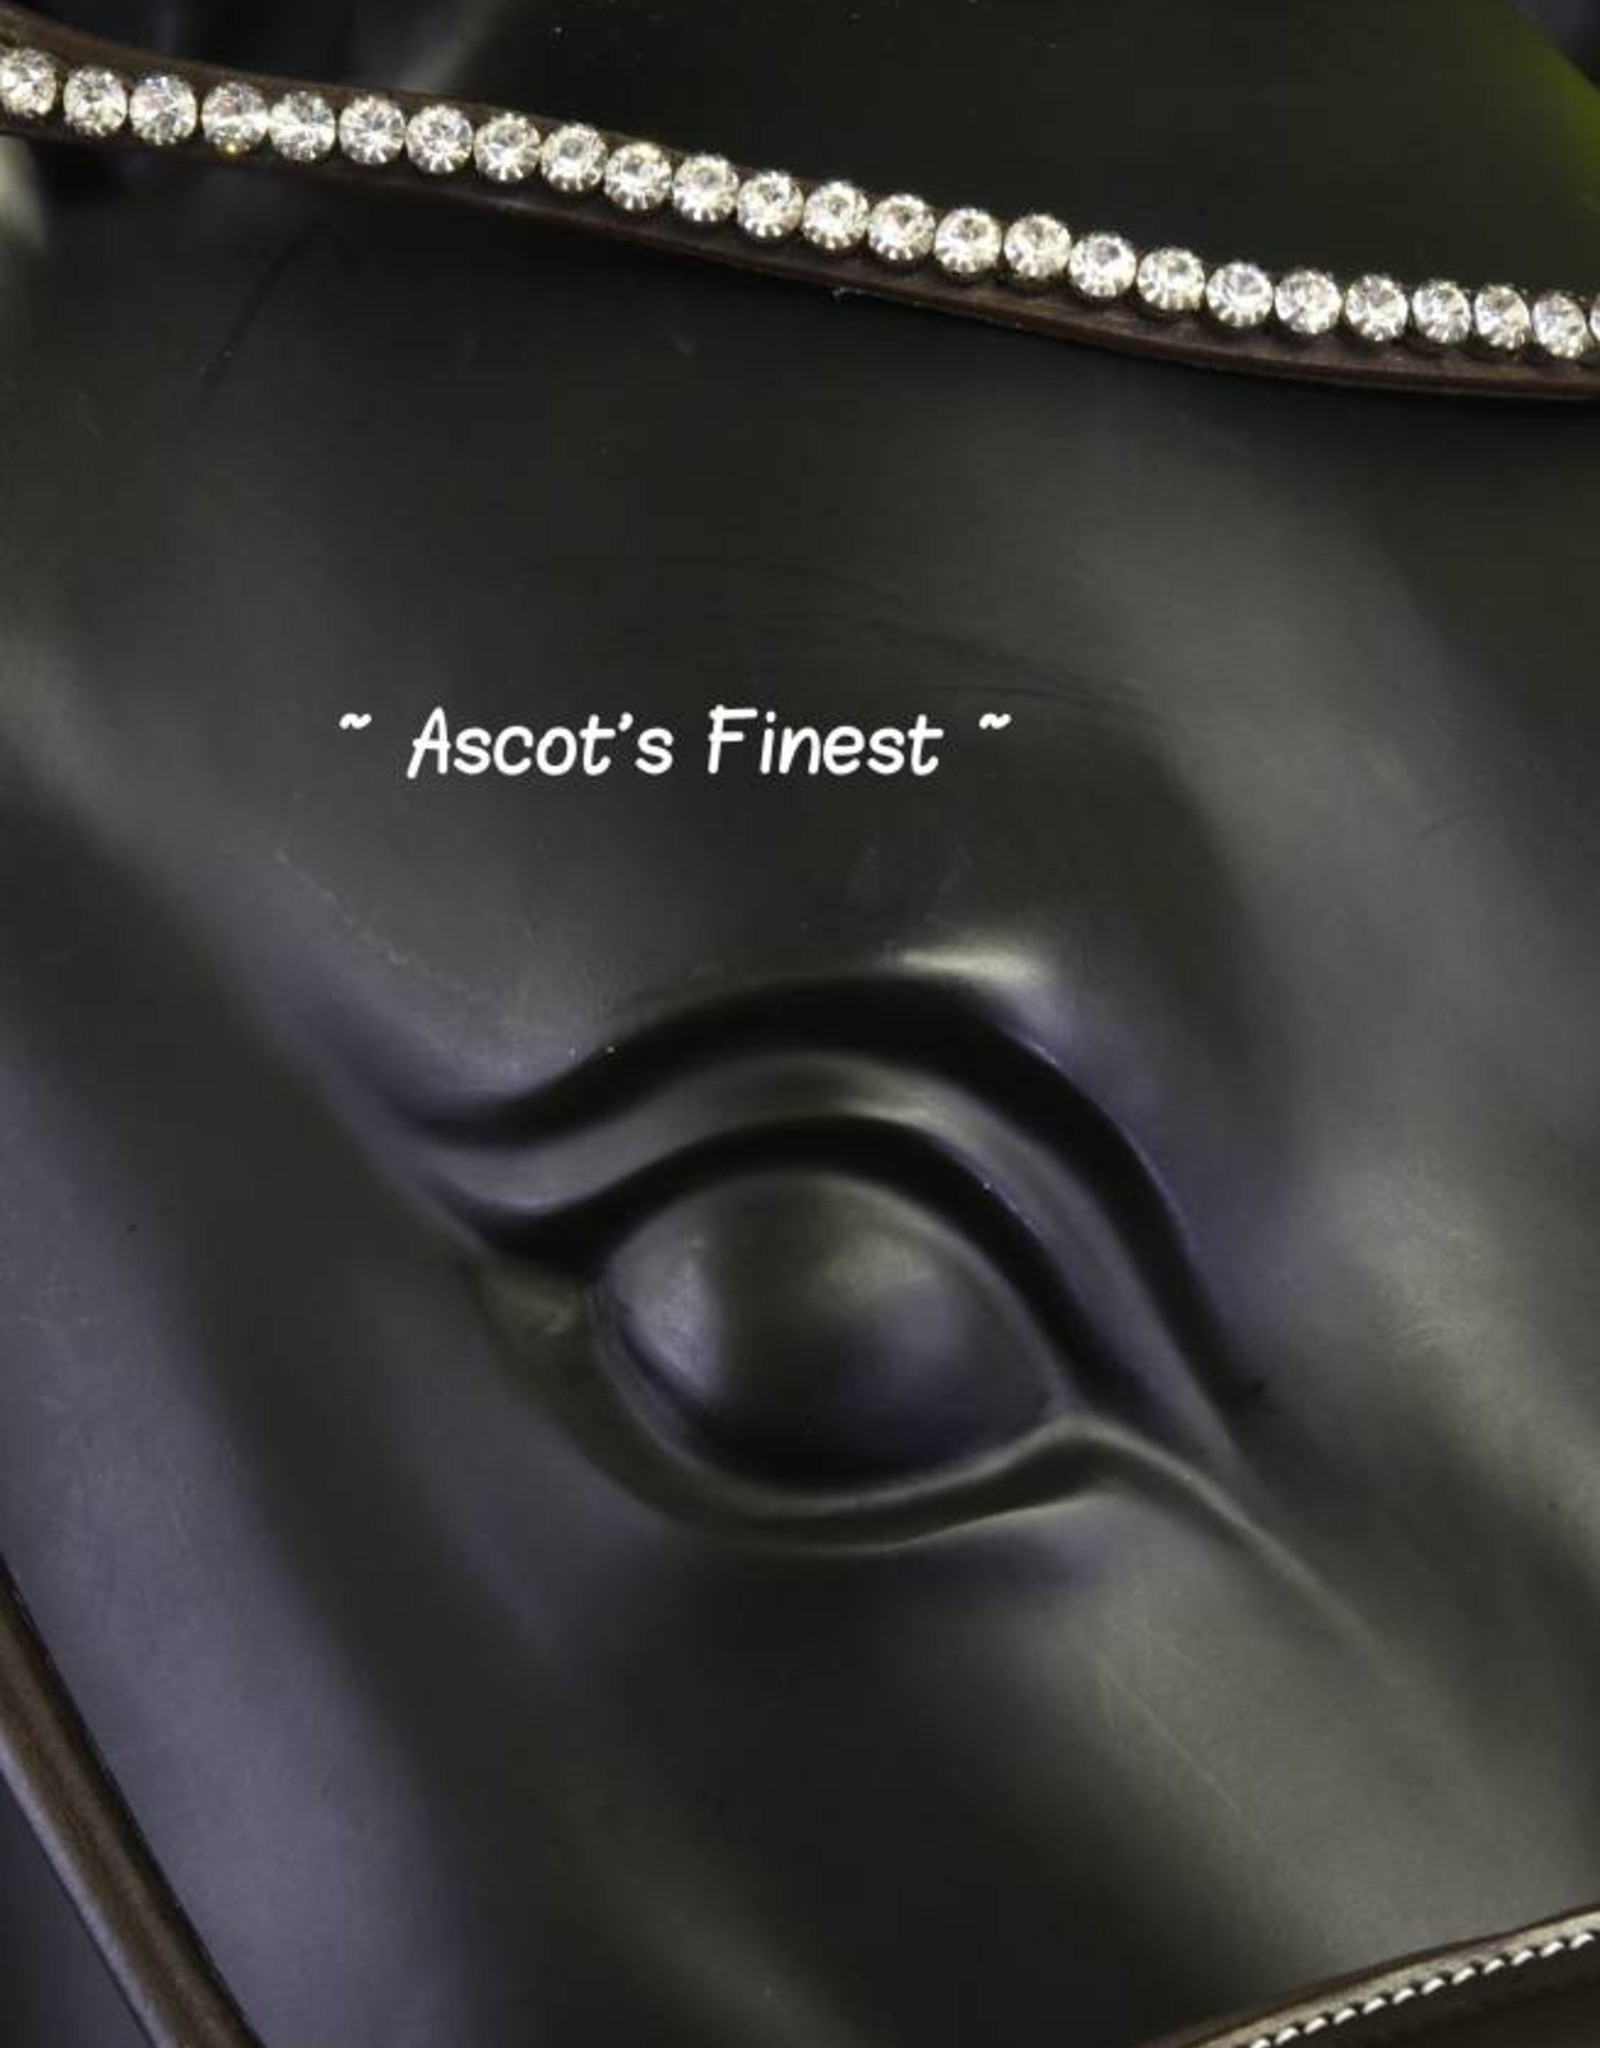 Ascot's Finest Havanna bruin rondgenaaid - Cob